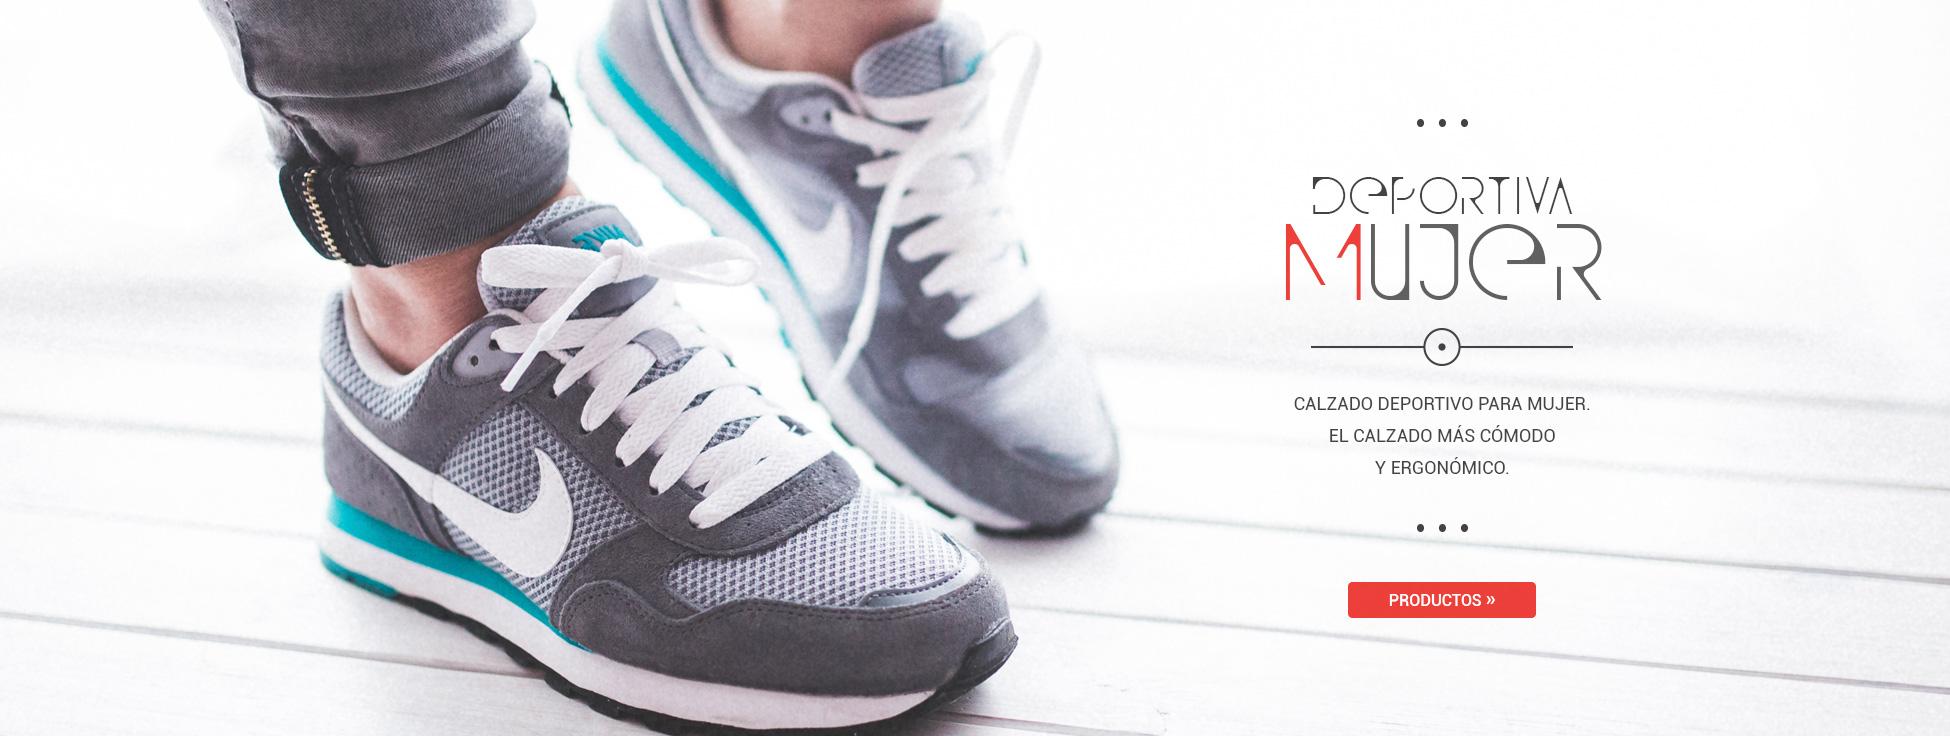 Calzado deportivo para mujer